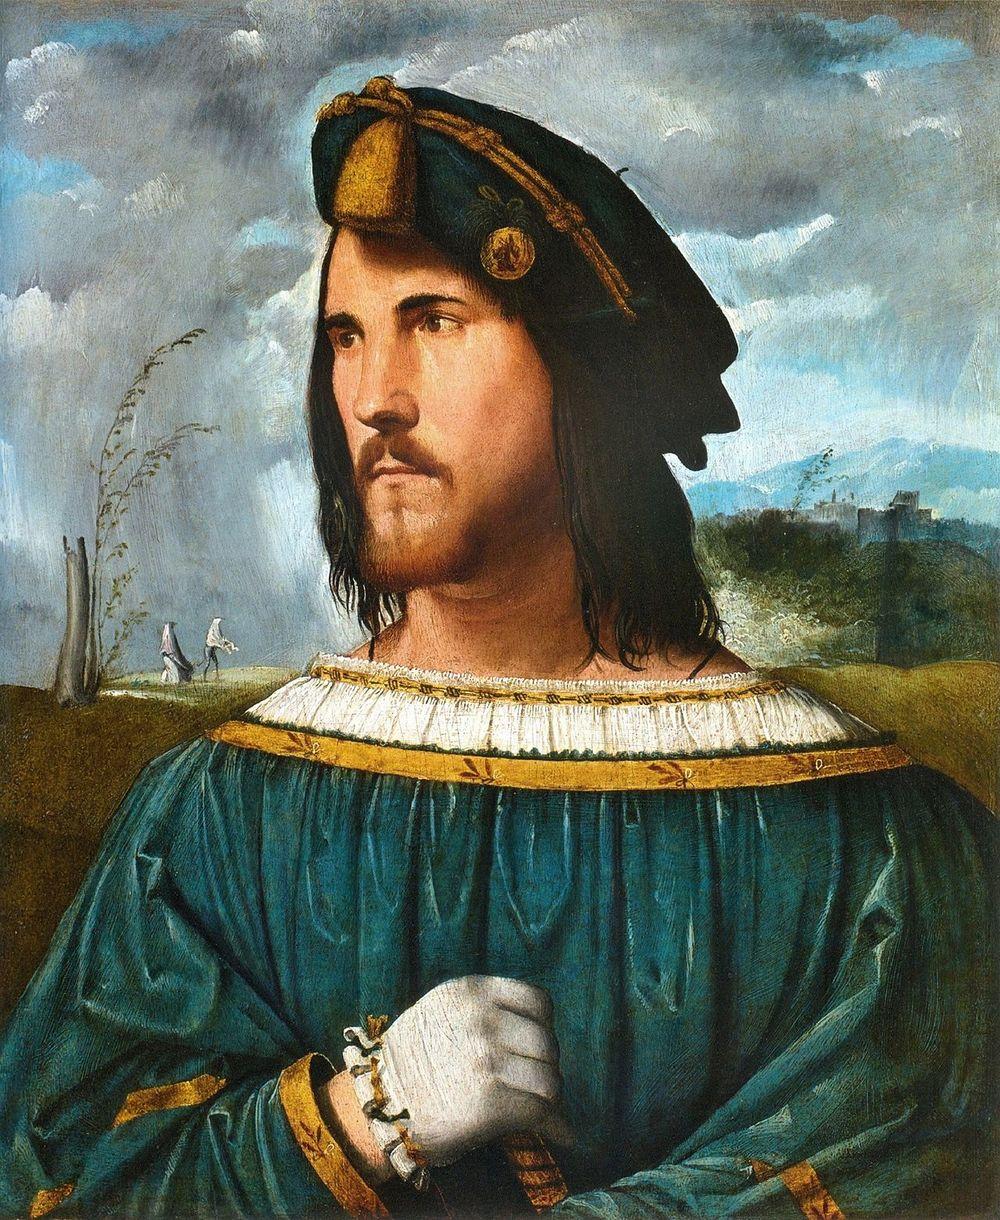 César Borgia (por Altobello Melone), hijo del Papa Alejandro VI (Rodrigo Borgia) y hermano de la célebre Lucrecia Borgia.